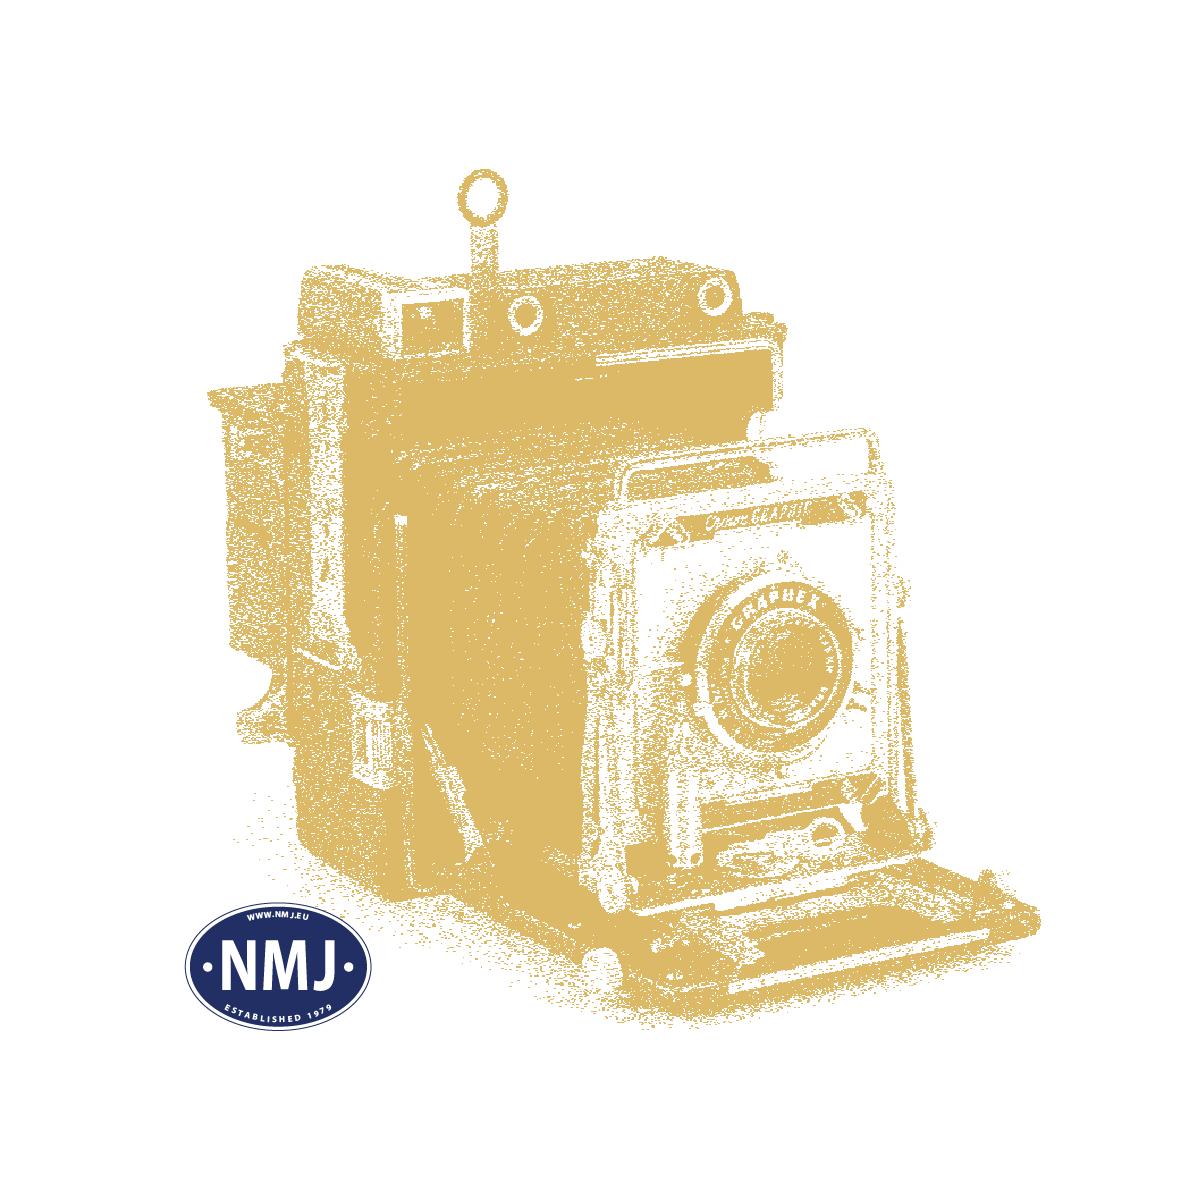 AUH44632 - Byggeplater, belegningsstein, N-skala